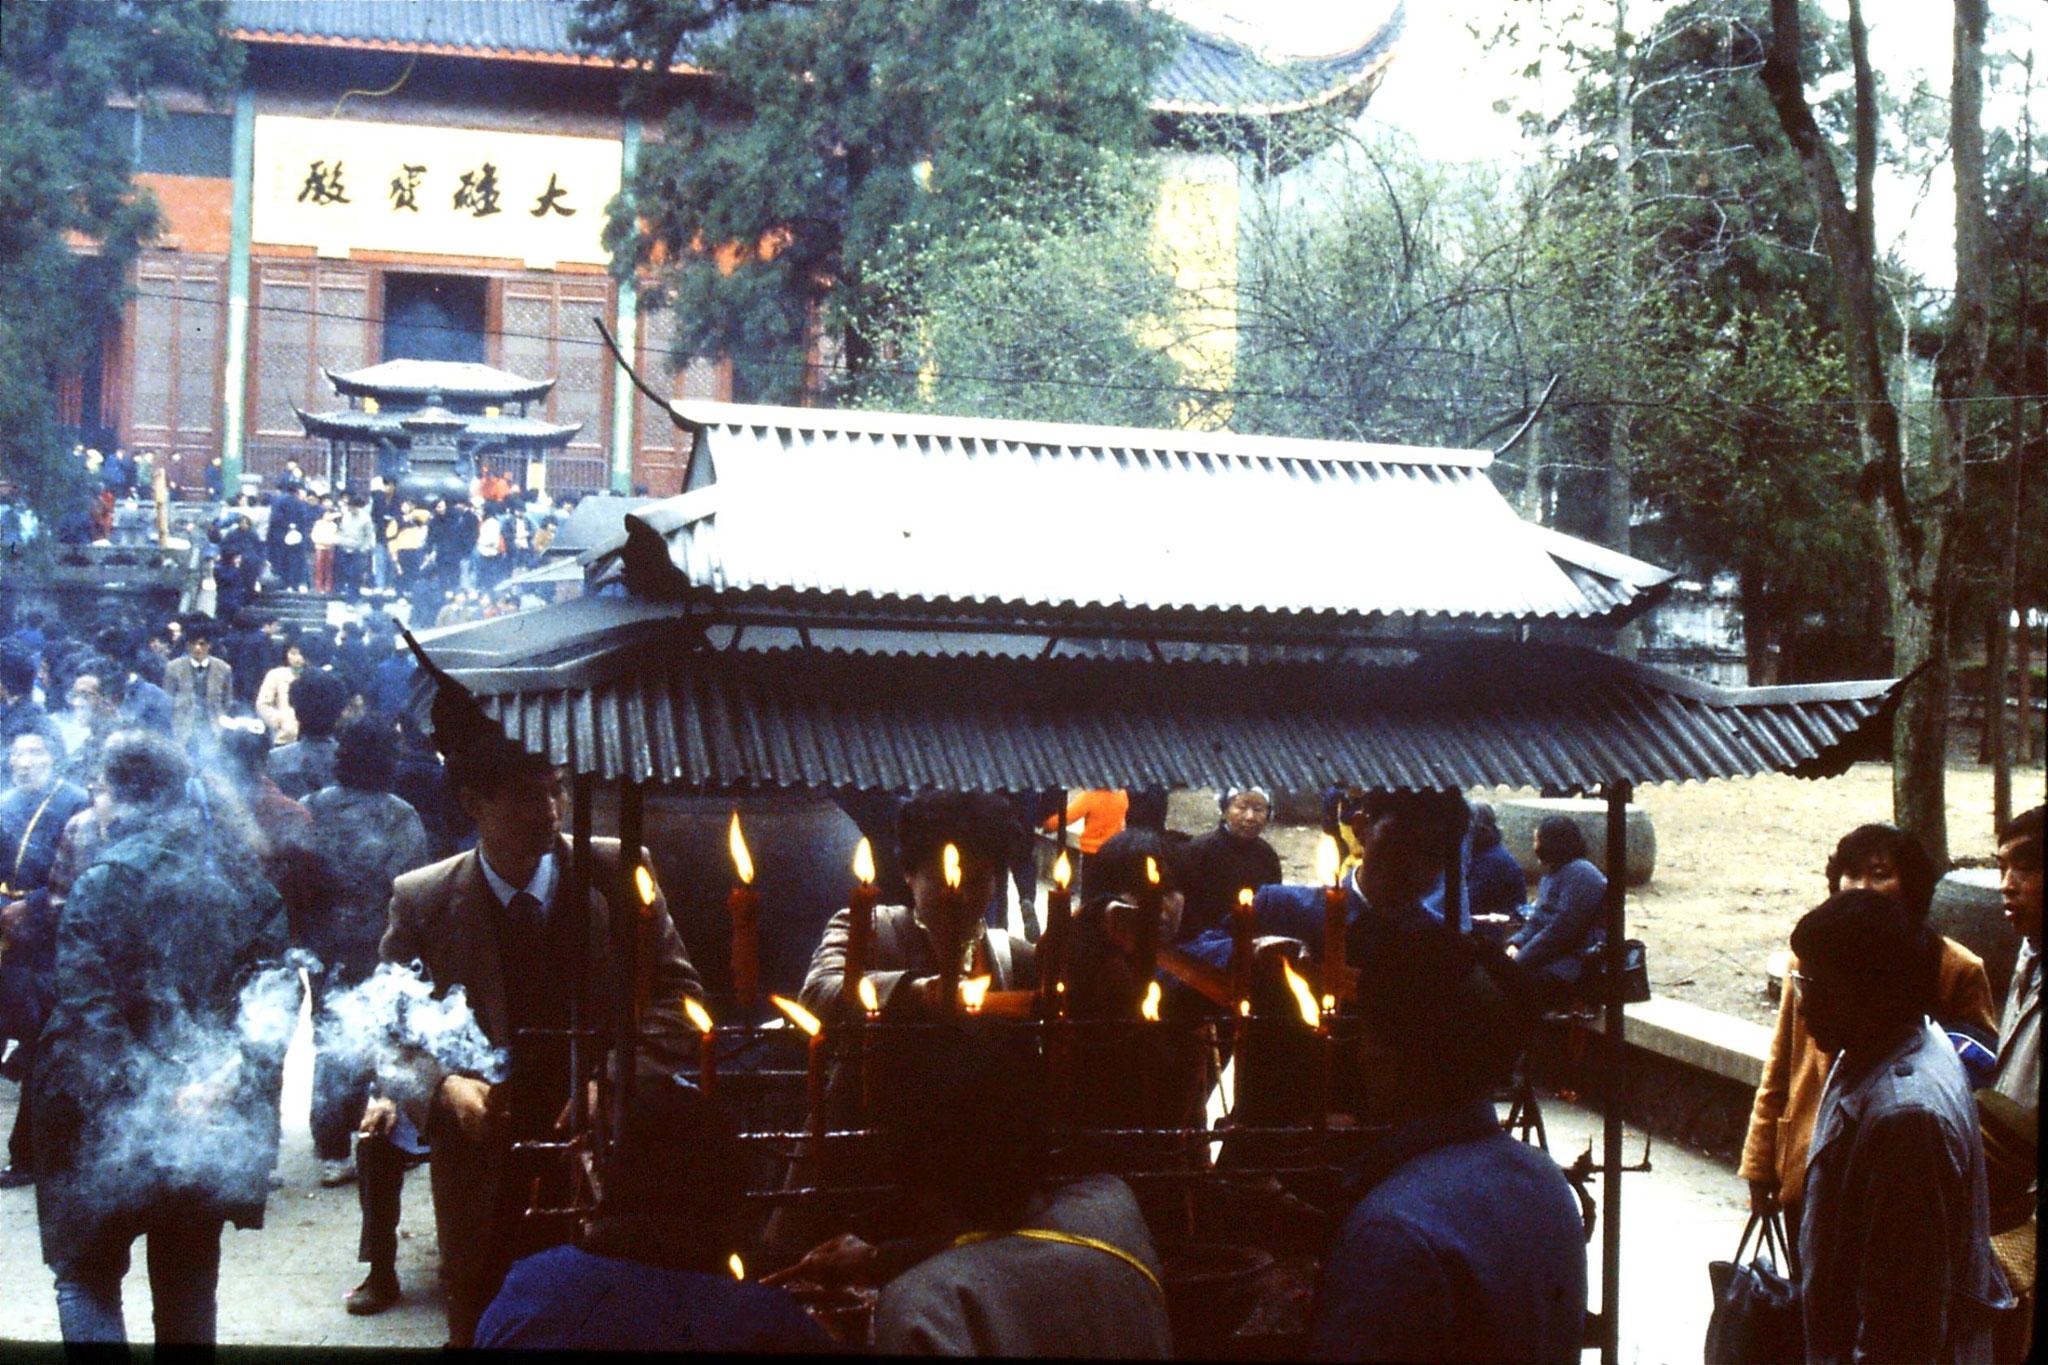 25/3/1989: 9: Hangzhou temple